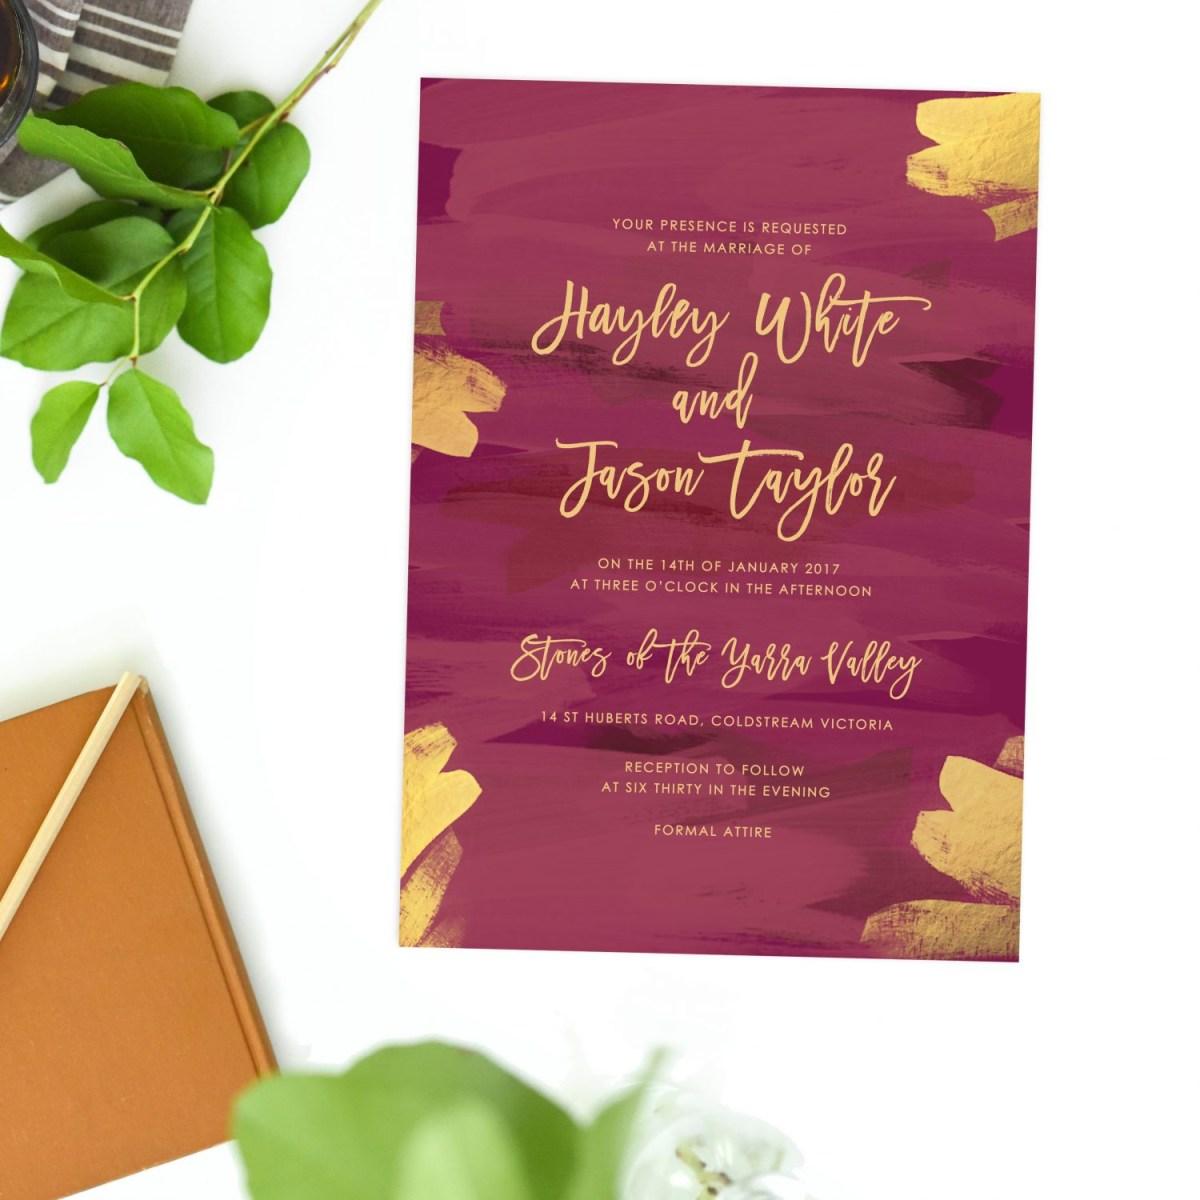 Burgundy Wedding Invitations Plum And Gold Burgundy Wedding Invitations